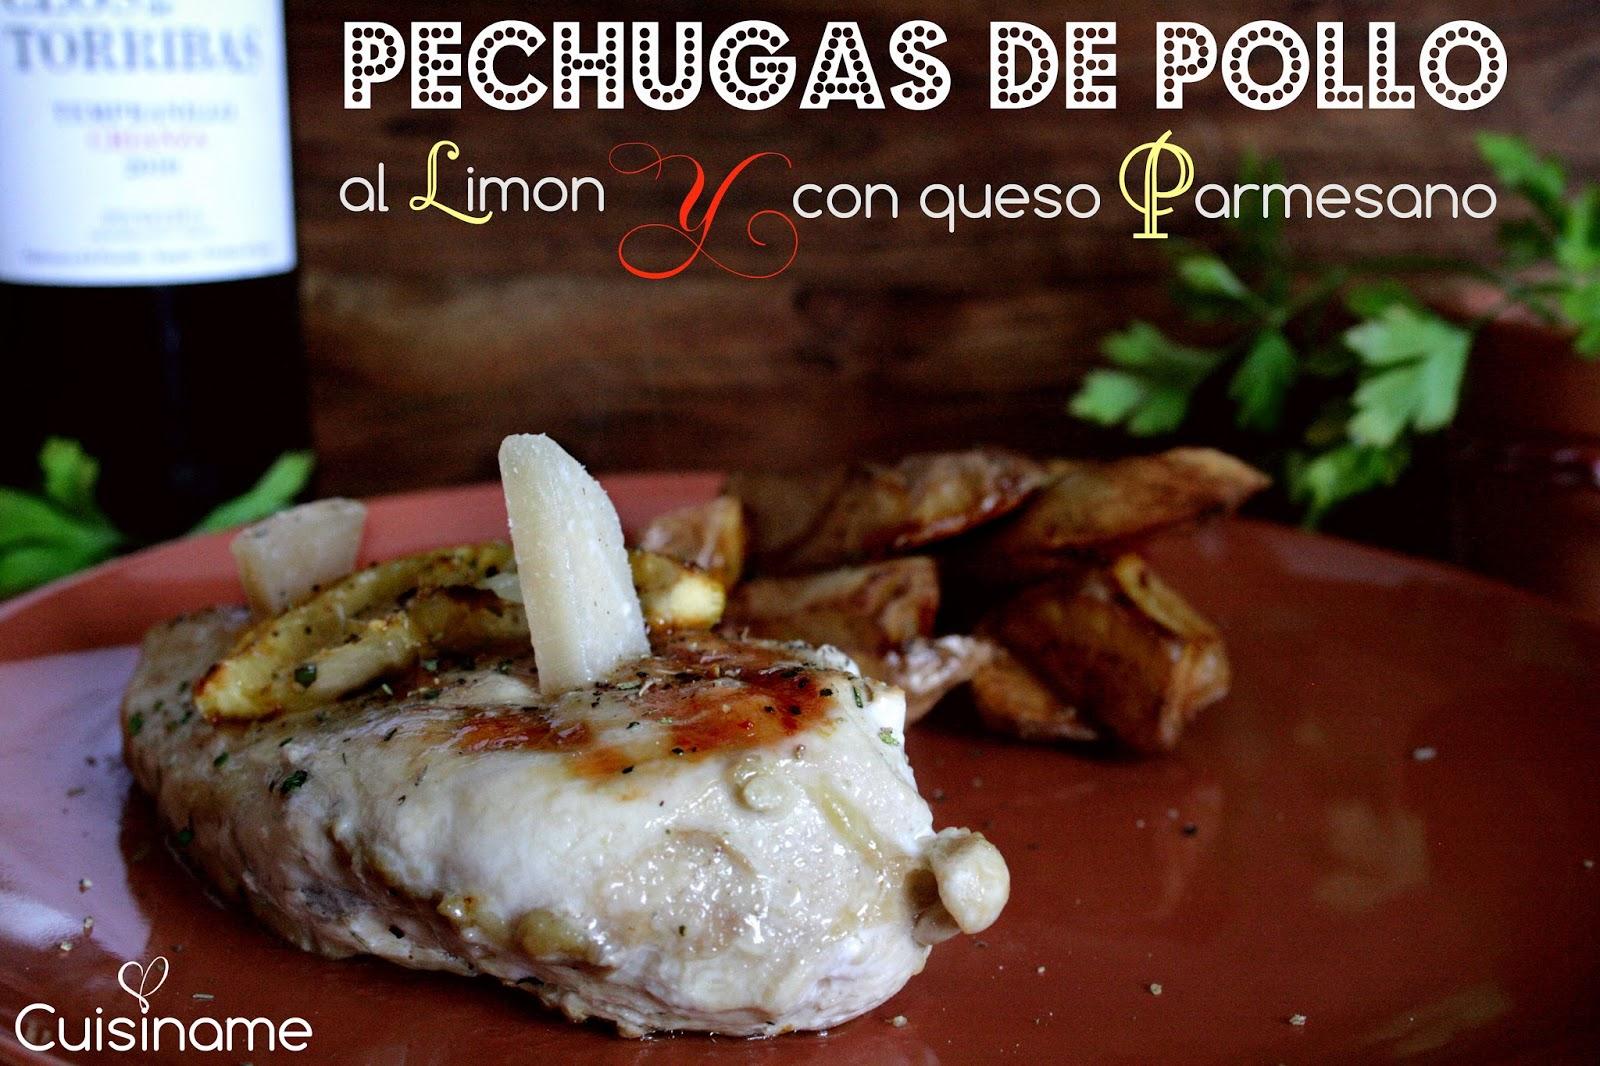 carne, pollo, pollo al limón, pollo con limón, pollo con patatas, especias, recetas de cocina, recetas originales, recetas caseras